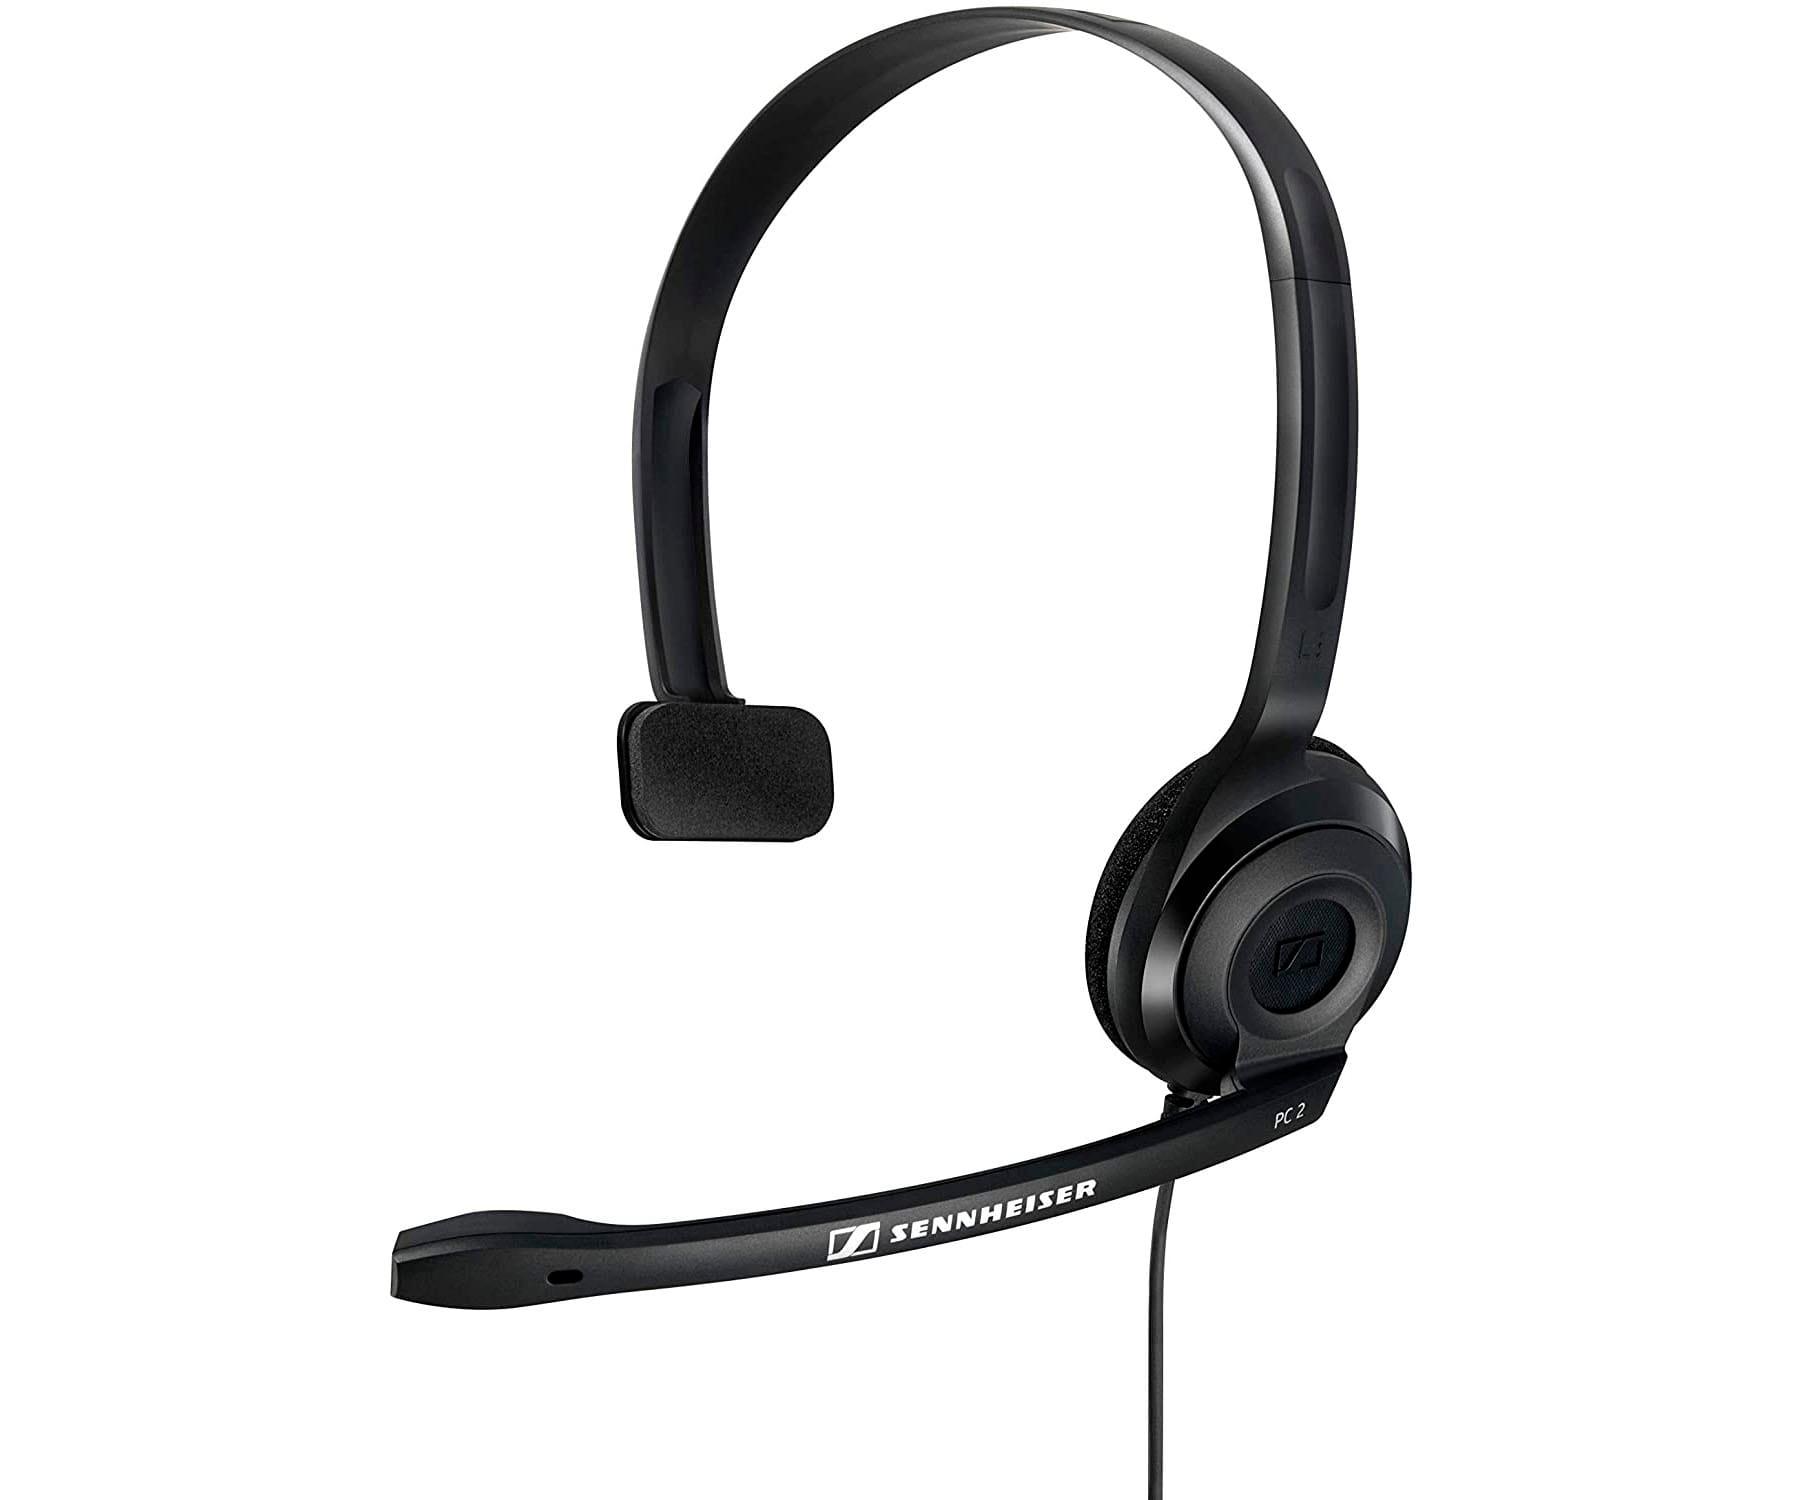 SENNHEISER PC 2 CHAT NEGRO AURICULAR ON-EAR MONOAURAL CON MICRÓFONO Y CONECTOR DUAL JACK 3.5mm